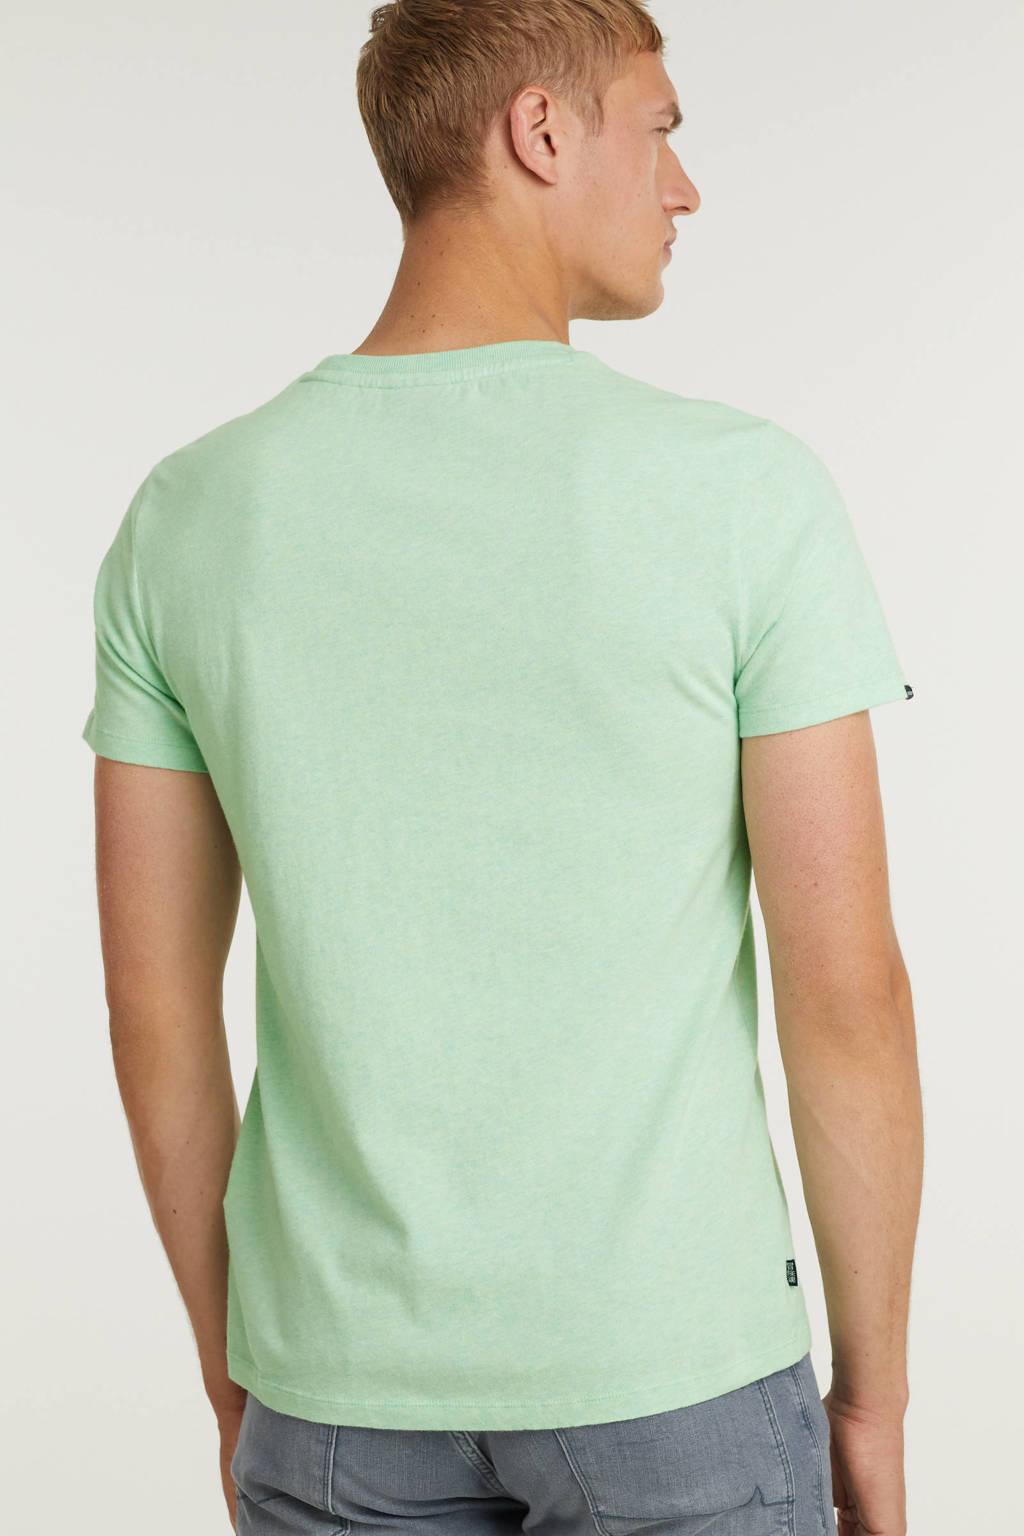 Superdry T-shirt met logo mintgroen, Mintgroen